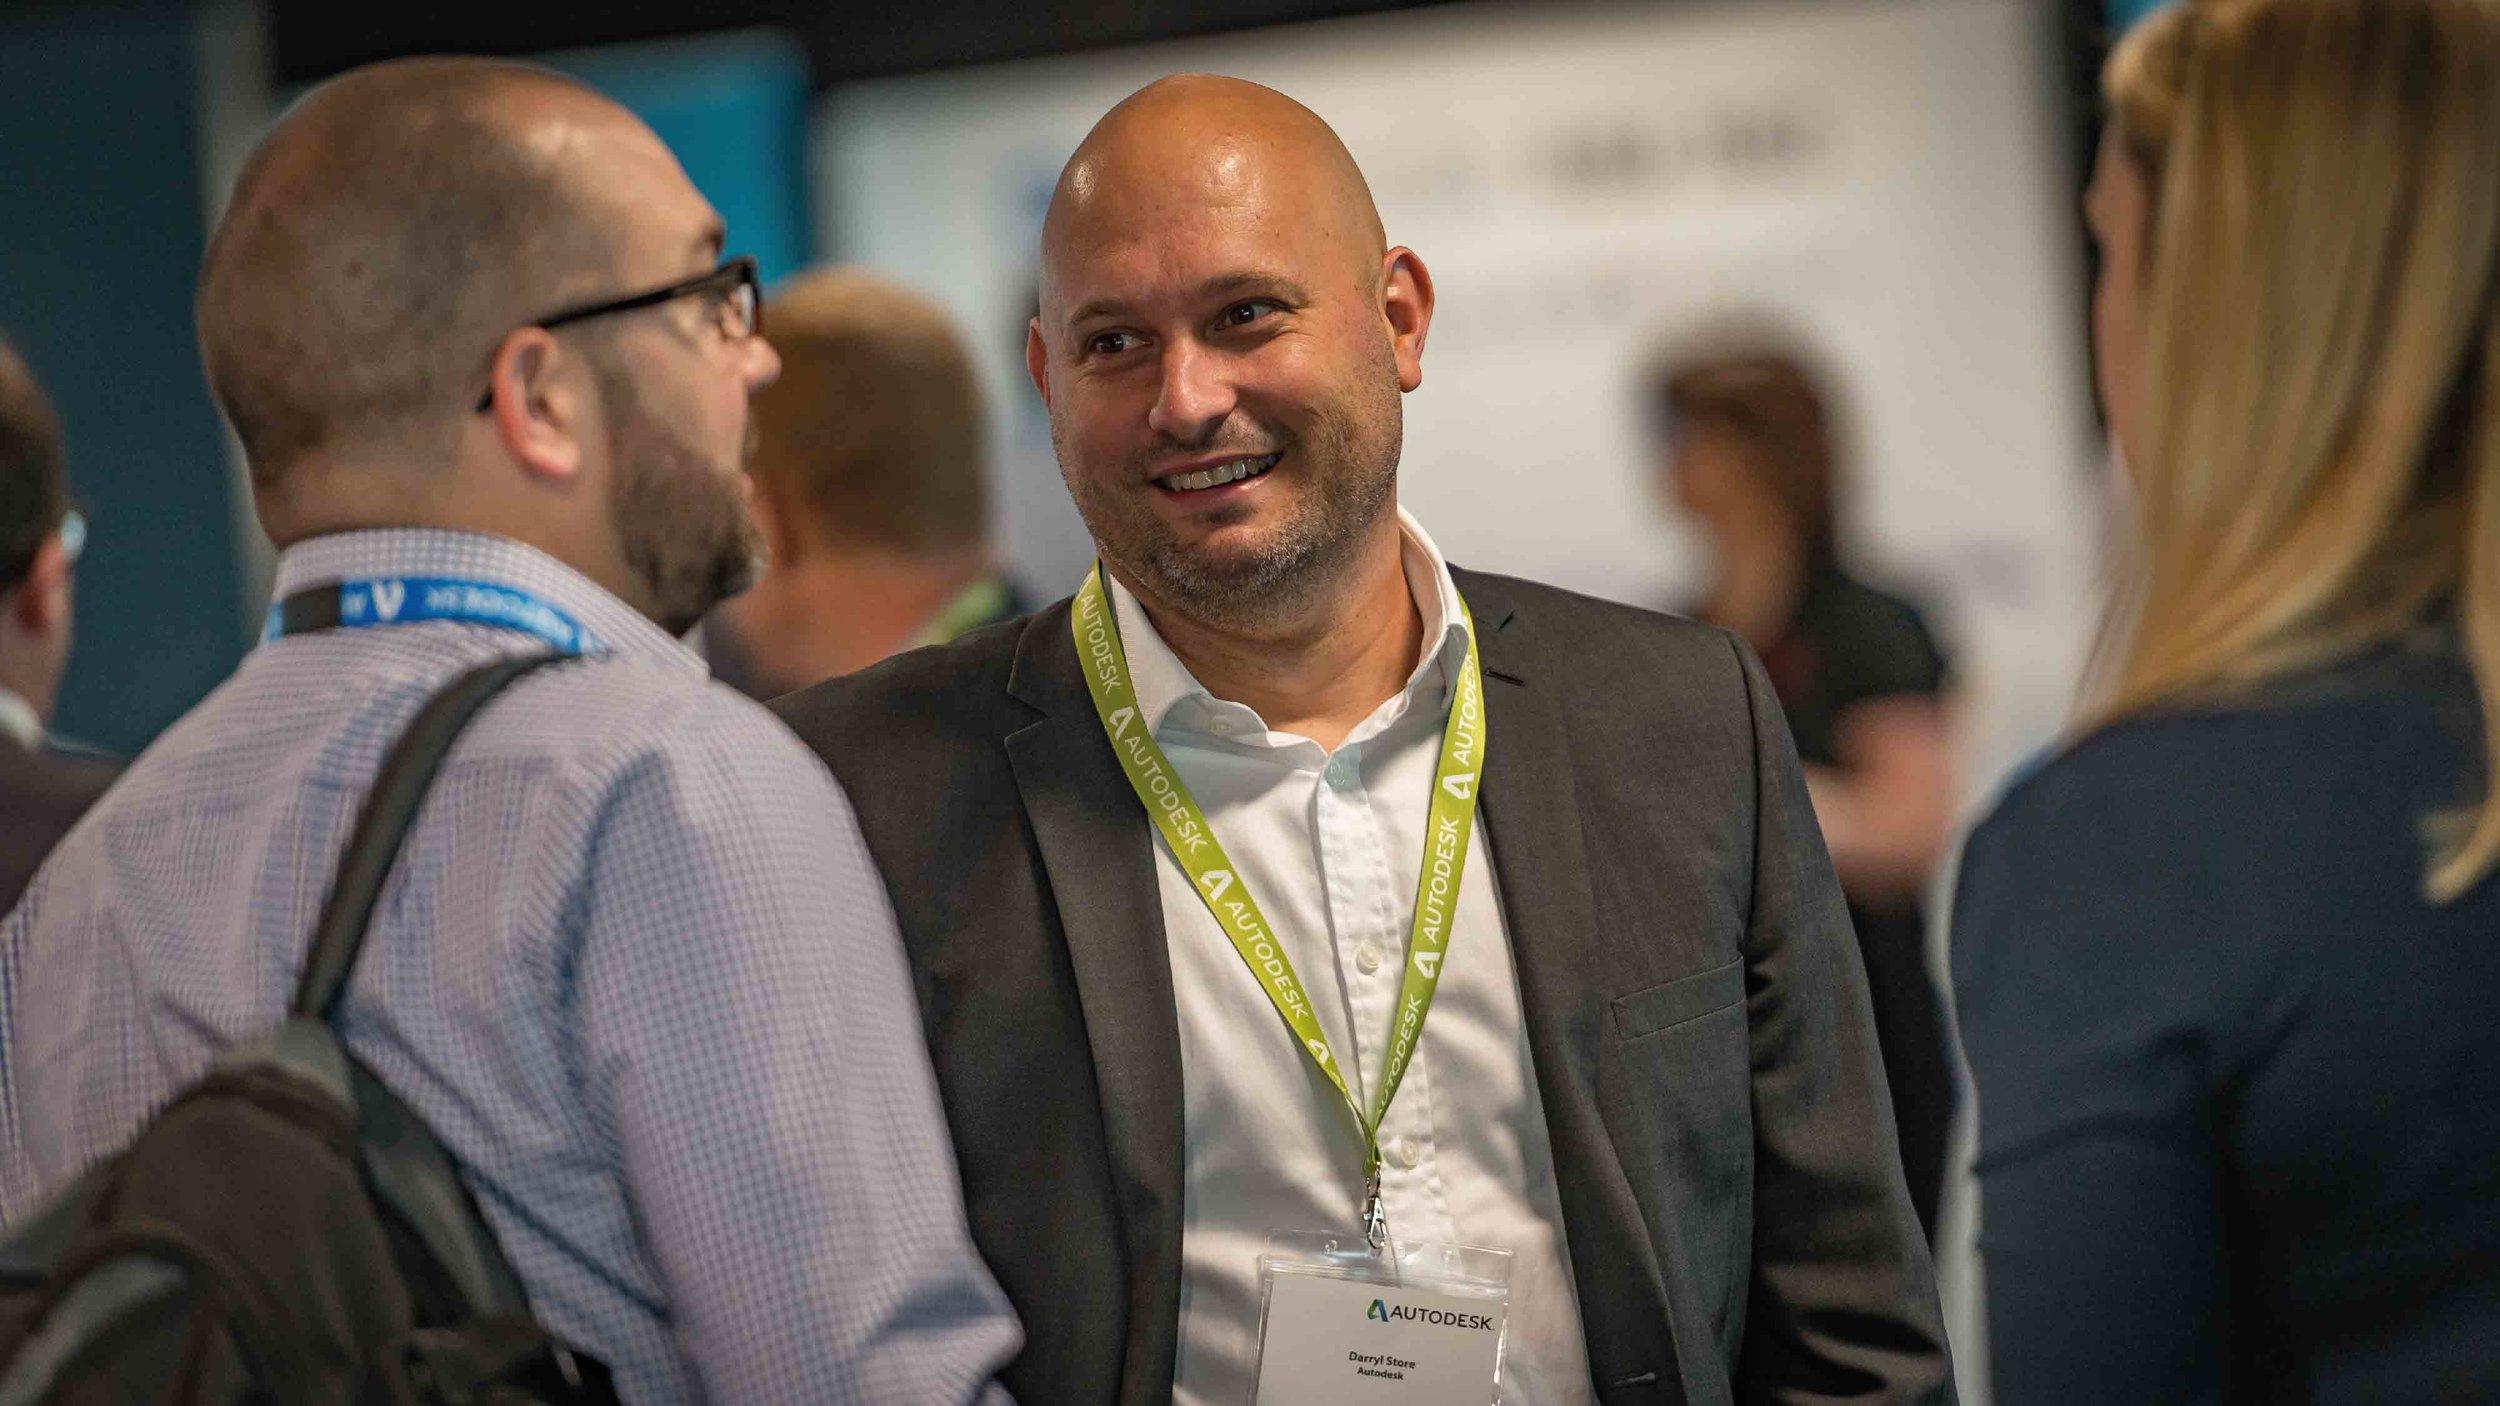 Autodesk Construction Event UK 2016-25.jpg